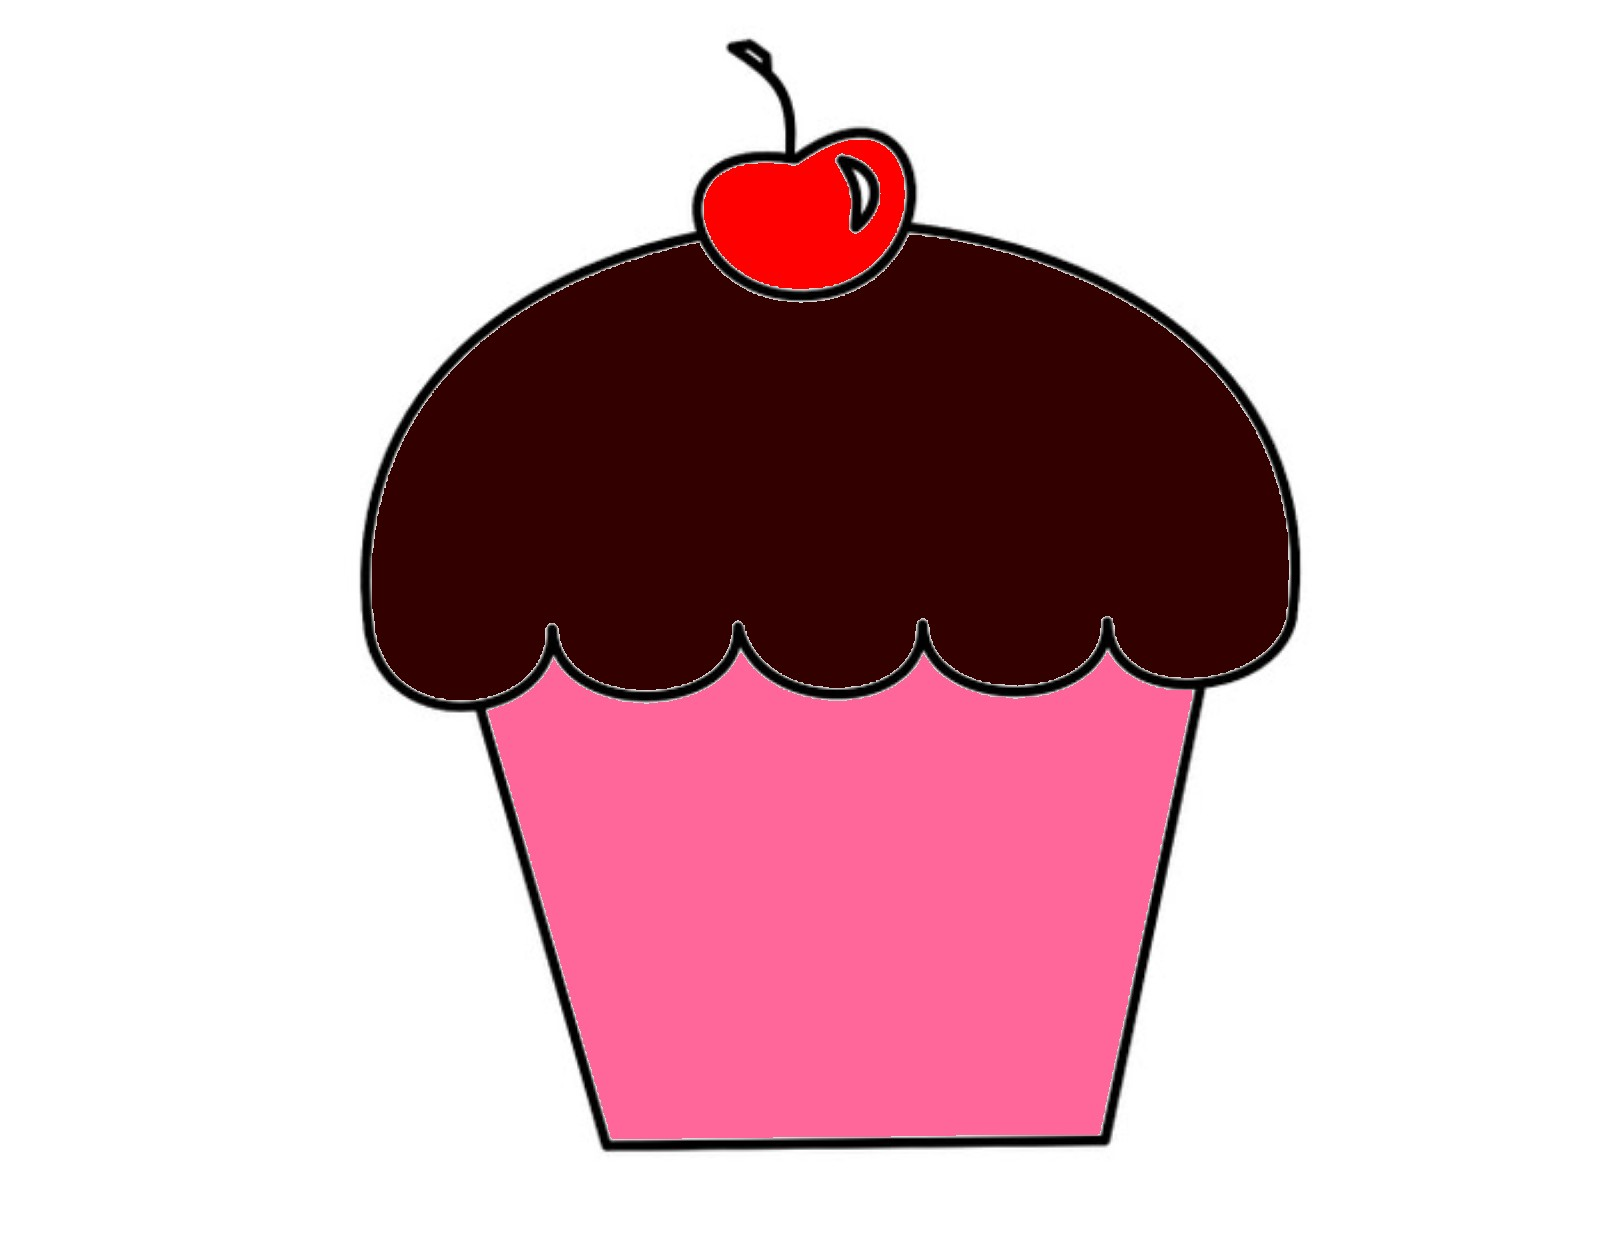 Cupcake | Free Images at Clker.com - vector clip art ...